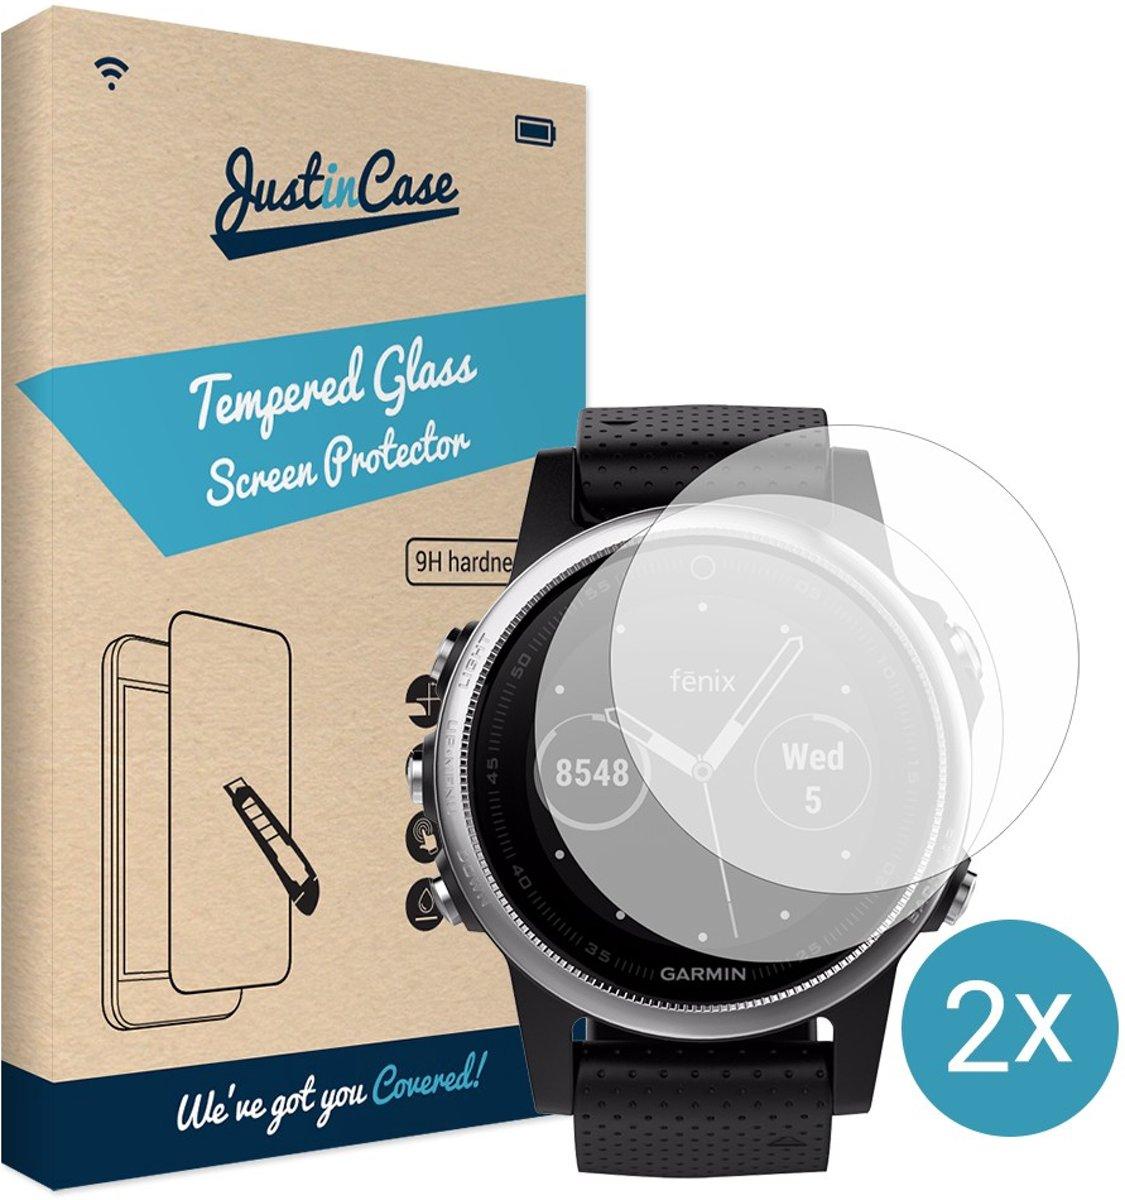 Just in Case Soft TPU Screen Protector Garmin Fenix 5S - 2 pack kopen